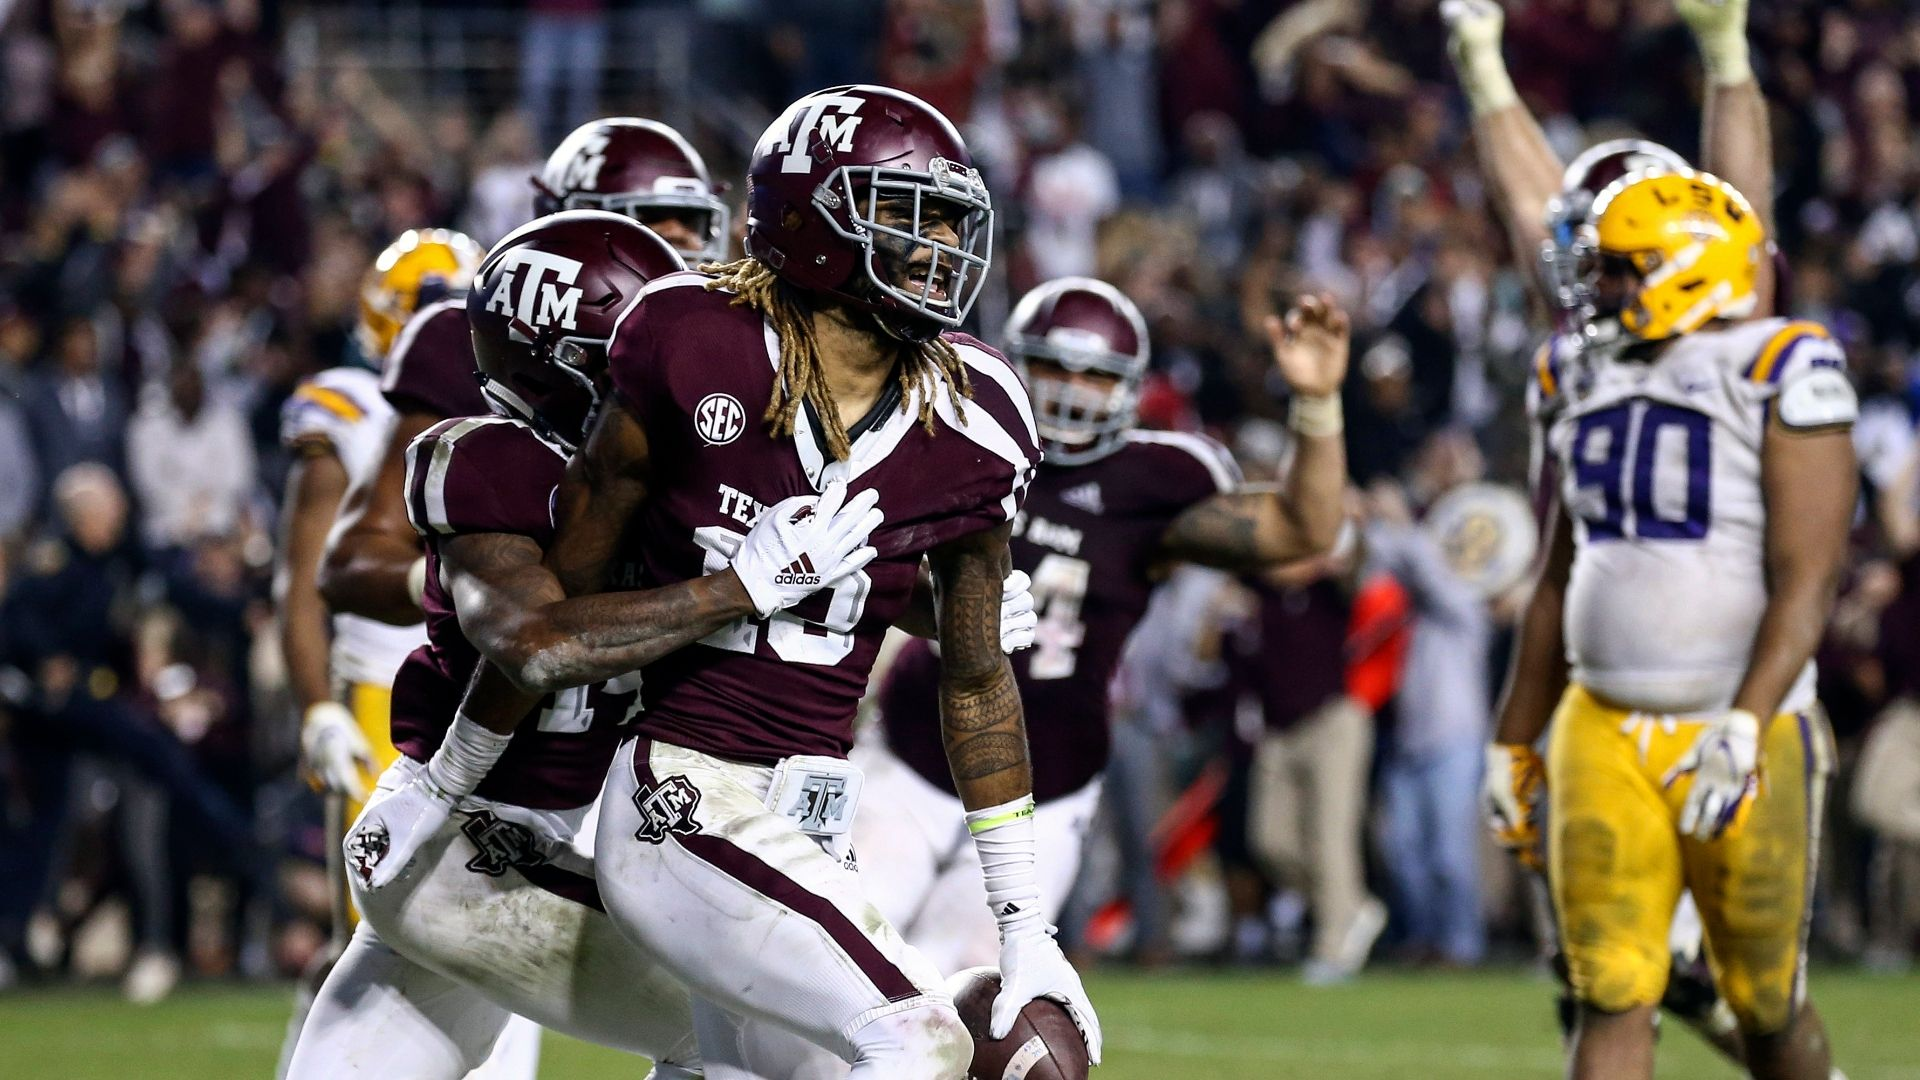 Texas A&M tops LSU in record-tying 7 OTs - ESPN Video